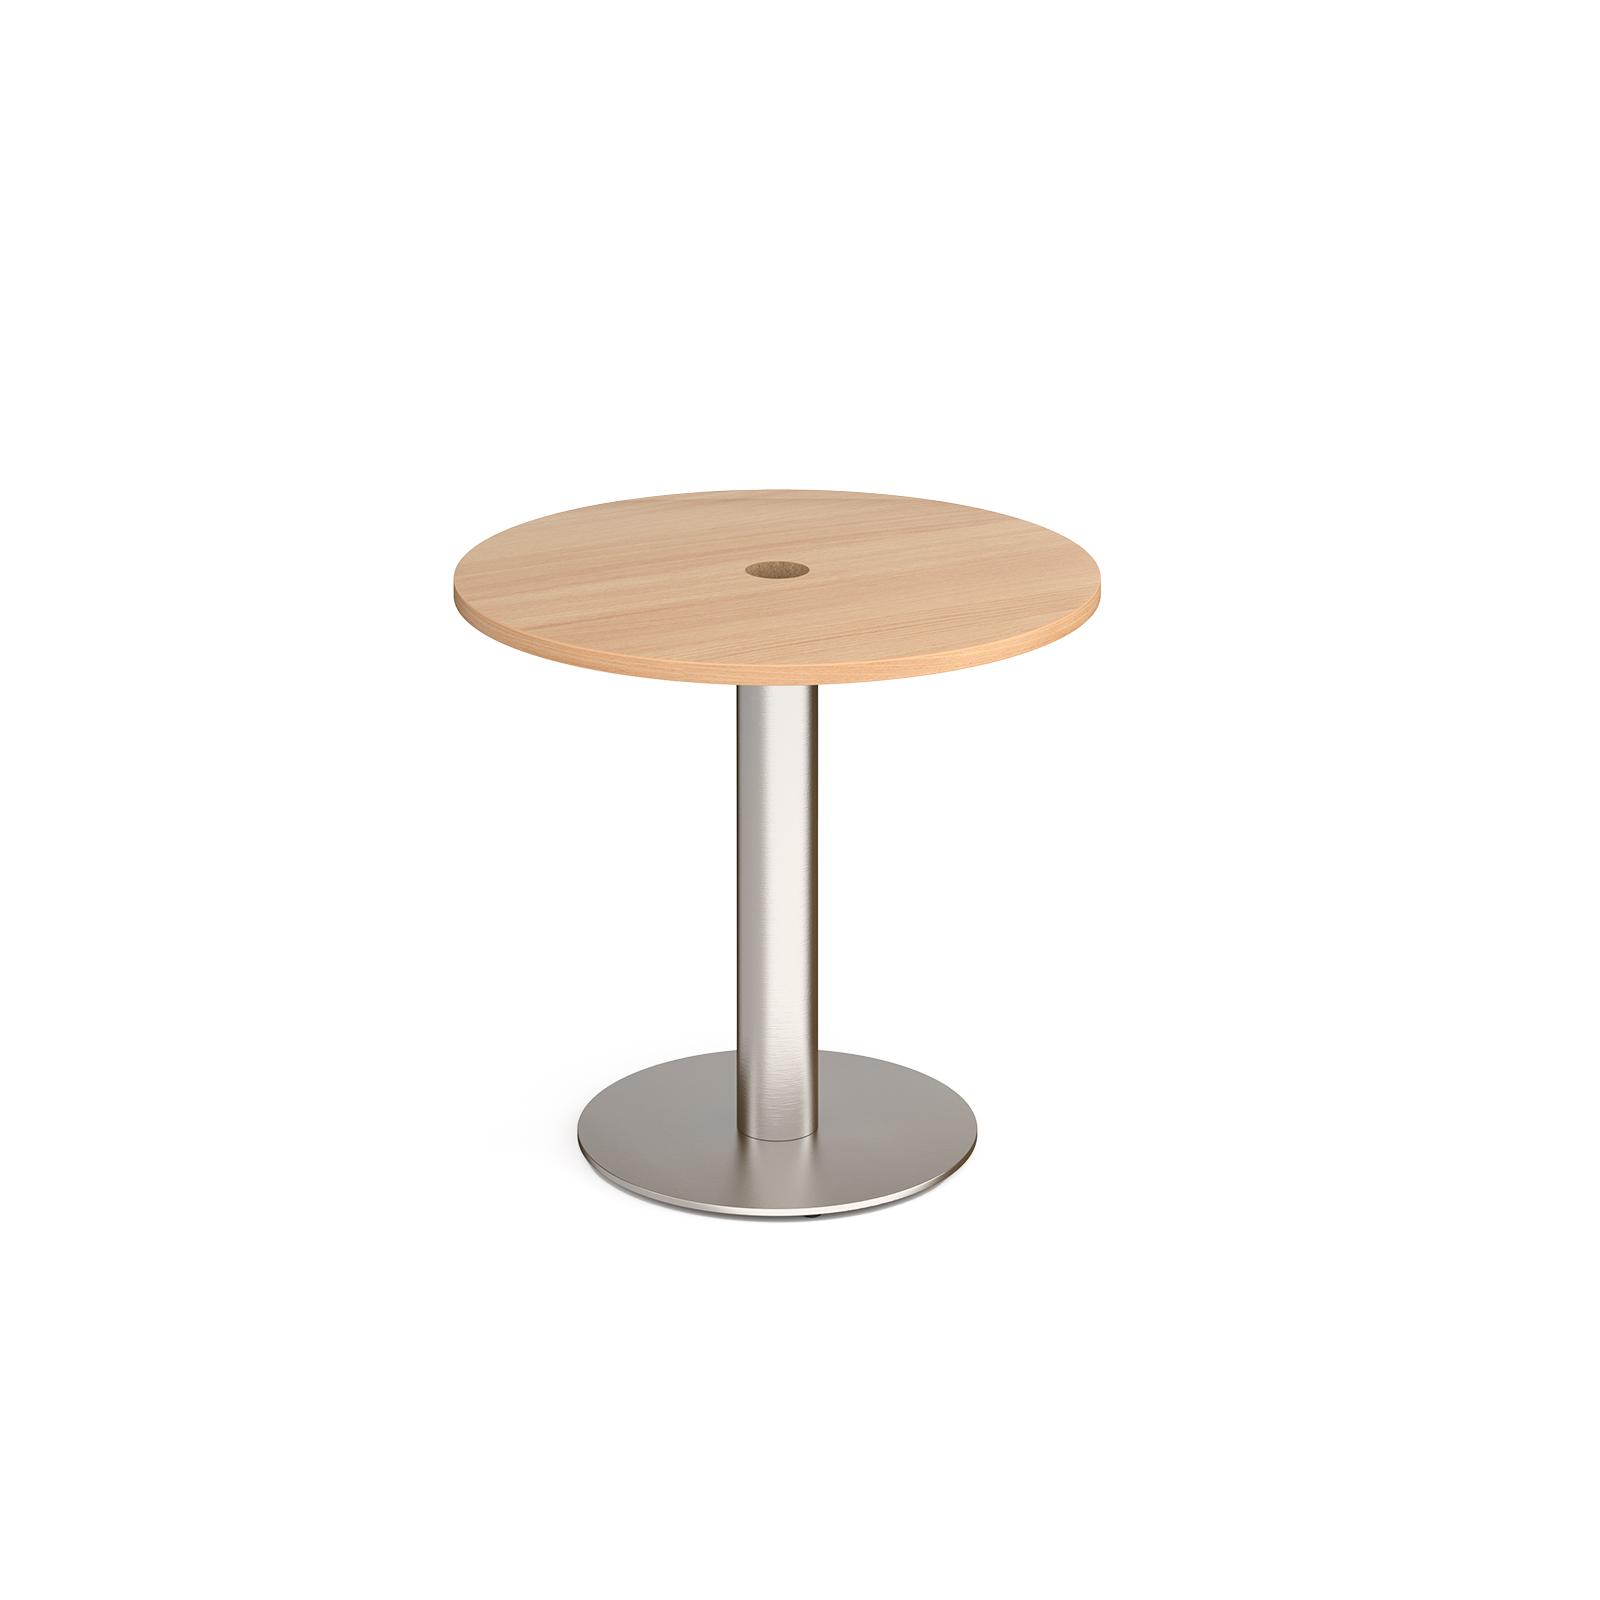 Canteen / Dining Monza circular power ready dining table